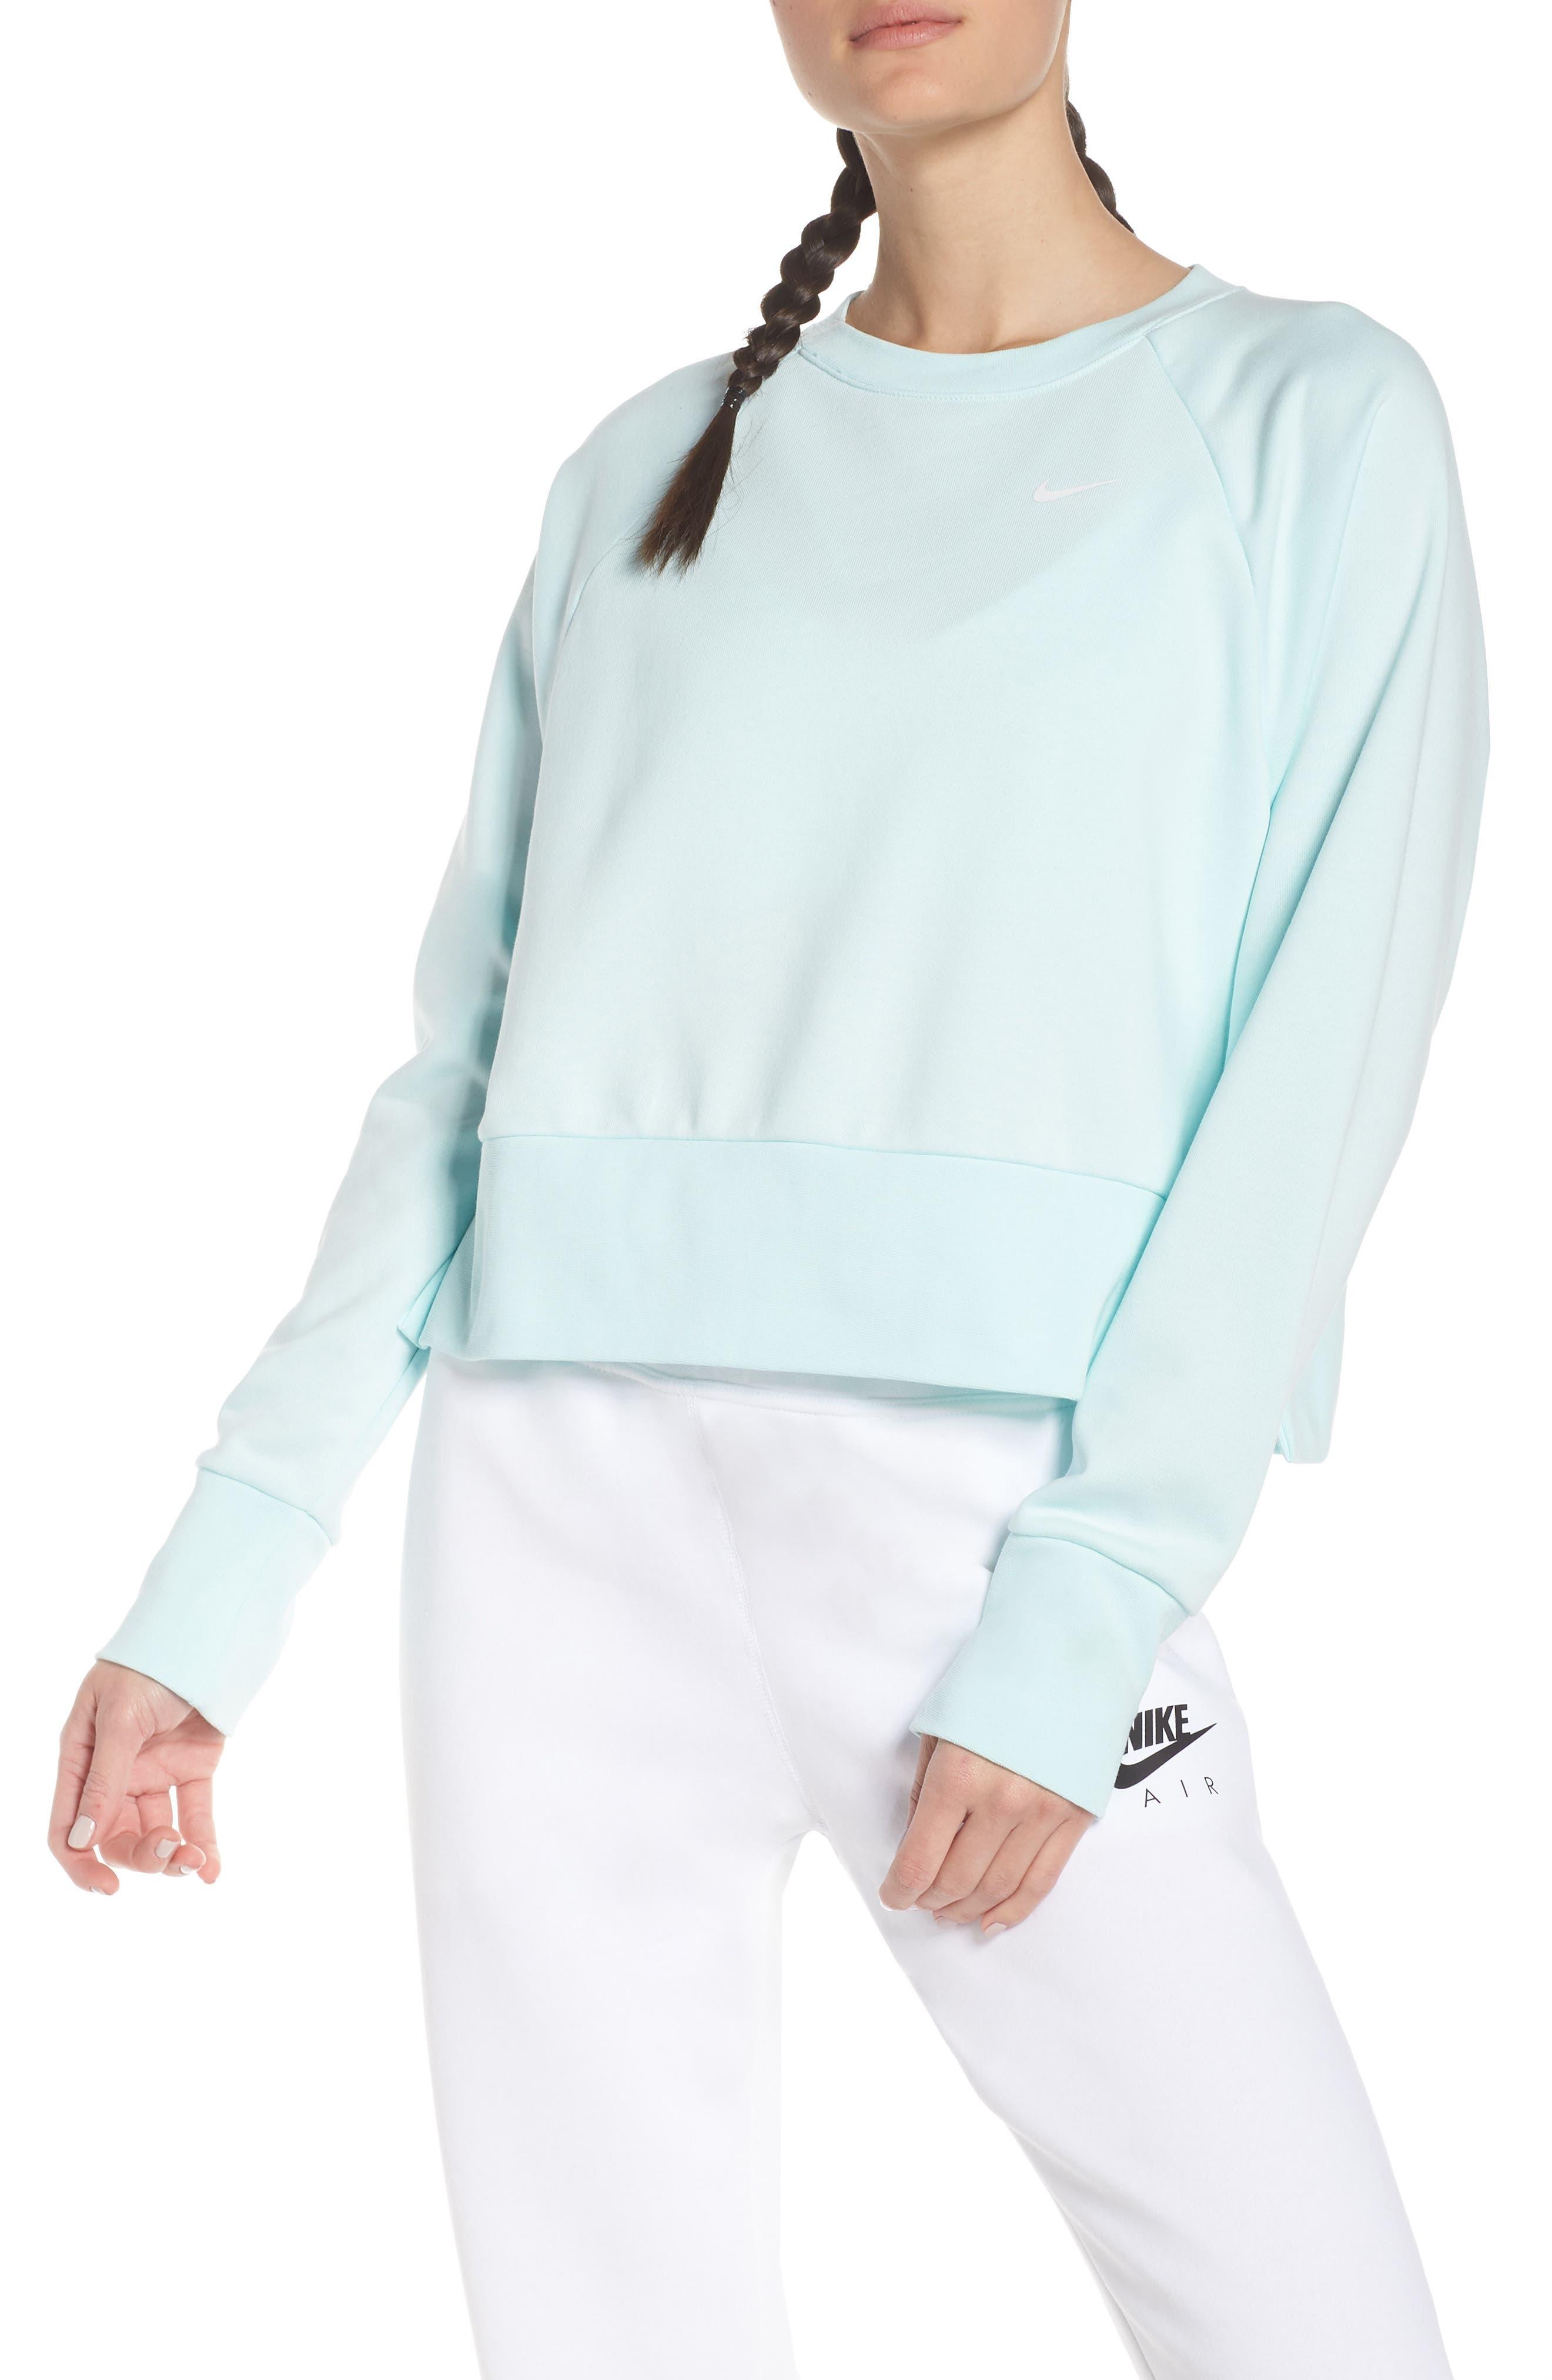 Nike Dry Crop Training Sweatshirt